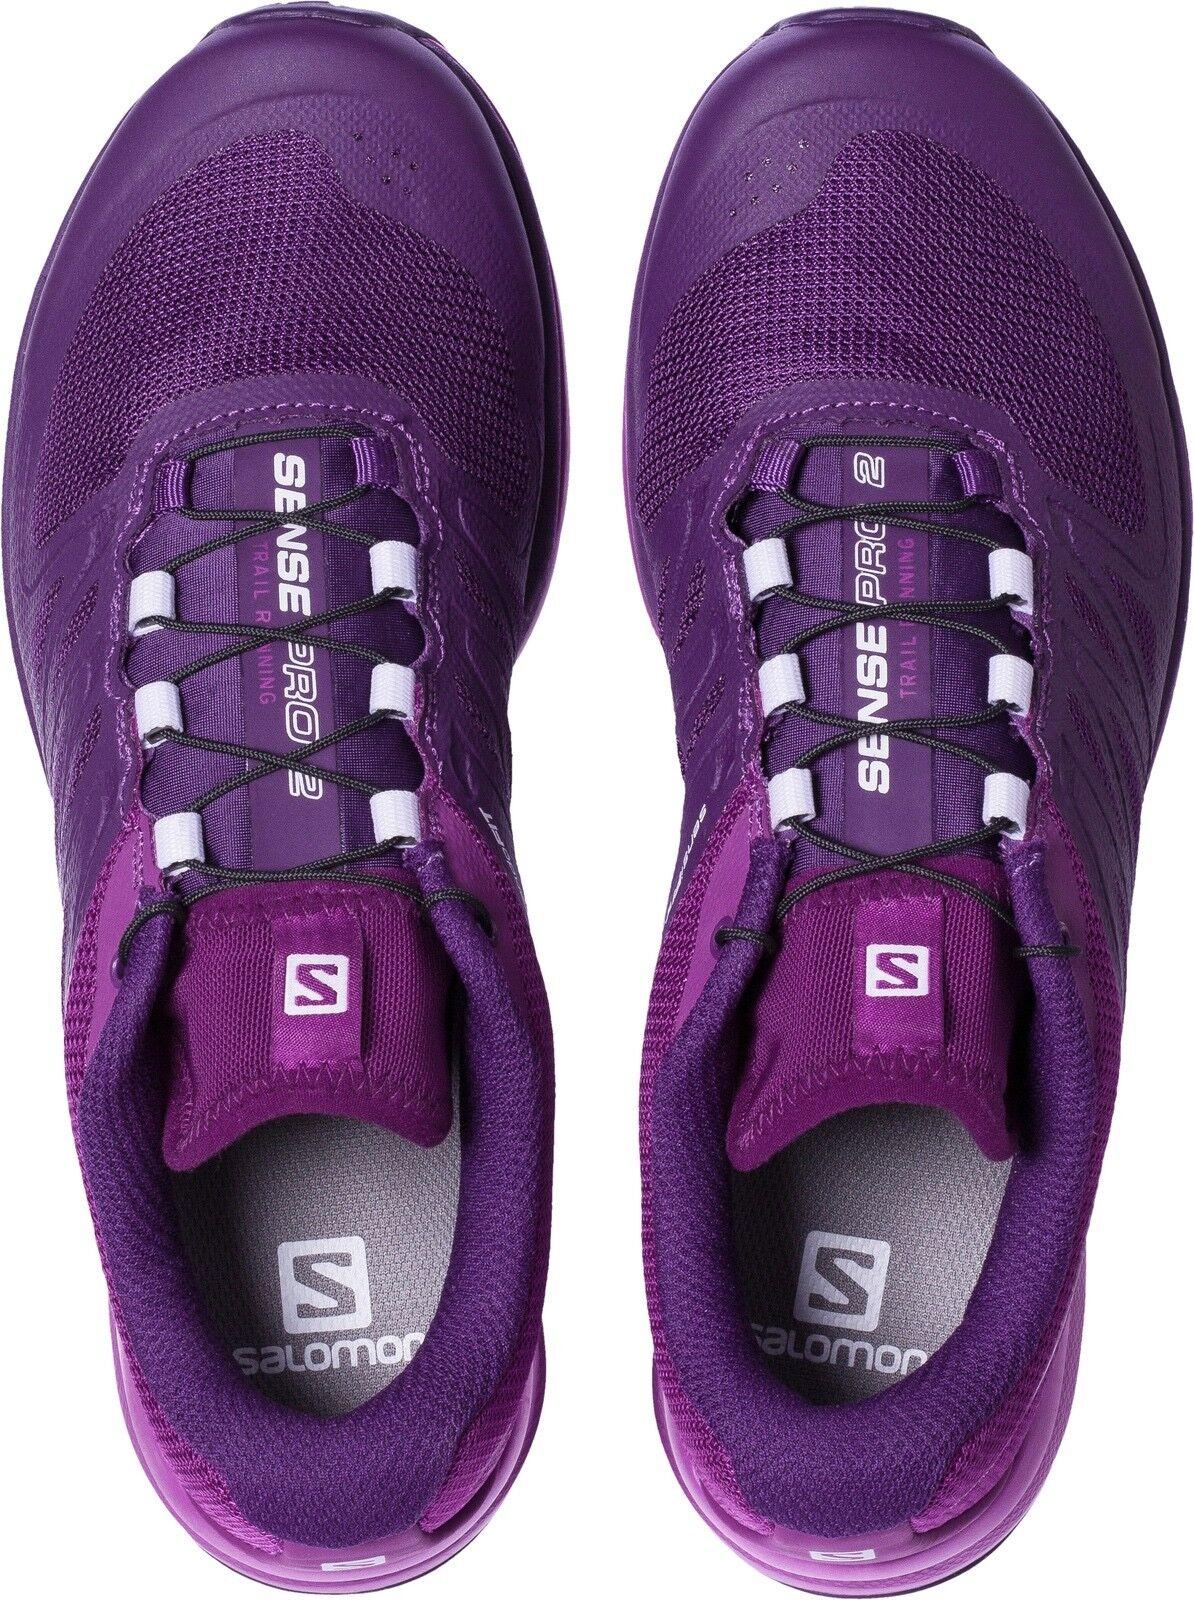 Salomon Sense Pro Trail Runner Cosmic Purple Women's 9